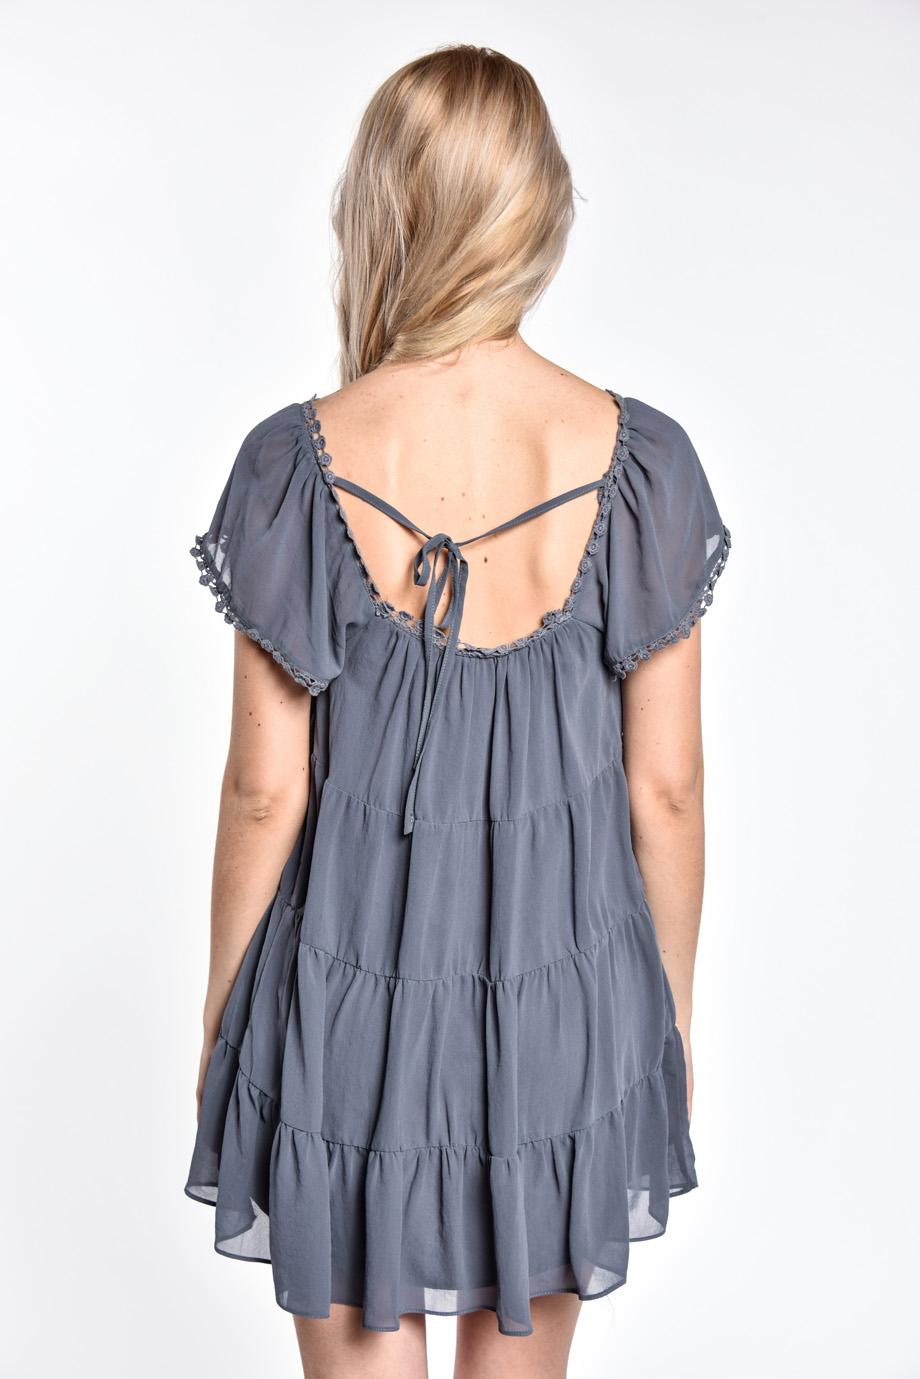 7f1f95601752 Modrošedé letné mini šaty - Shaty